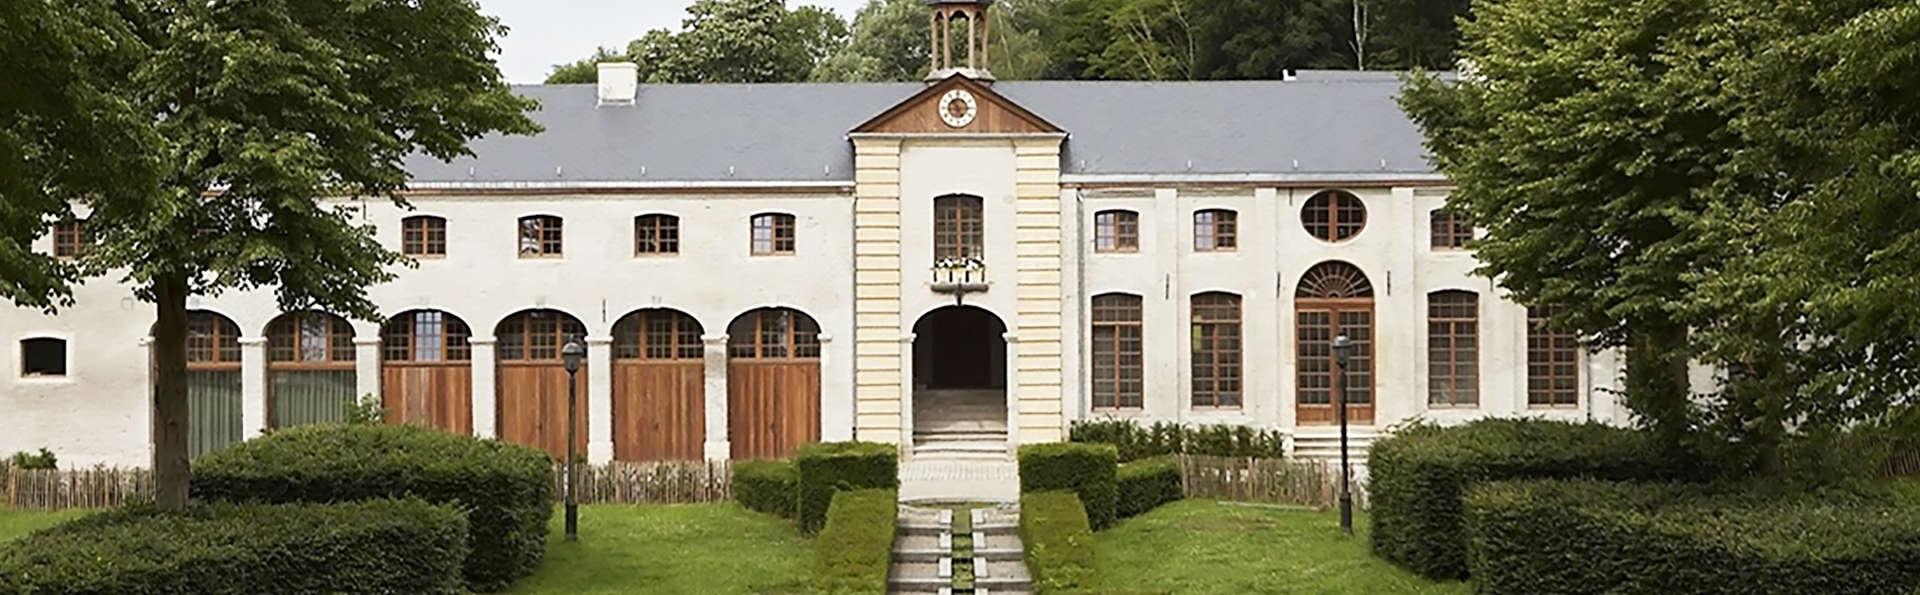 B&B Baron's House Neerijse-Leuven - EDIT_front.jpg